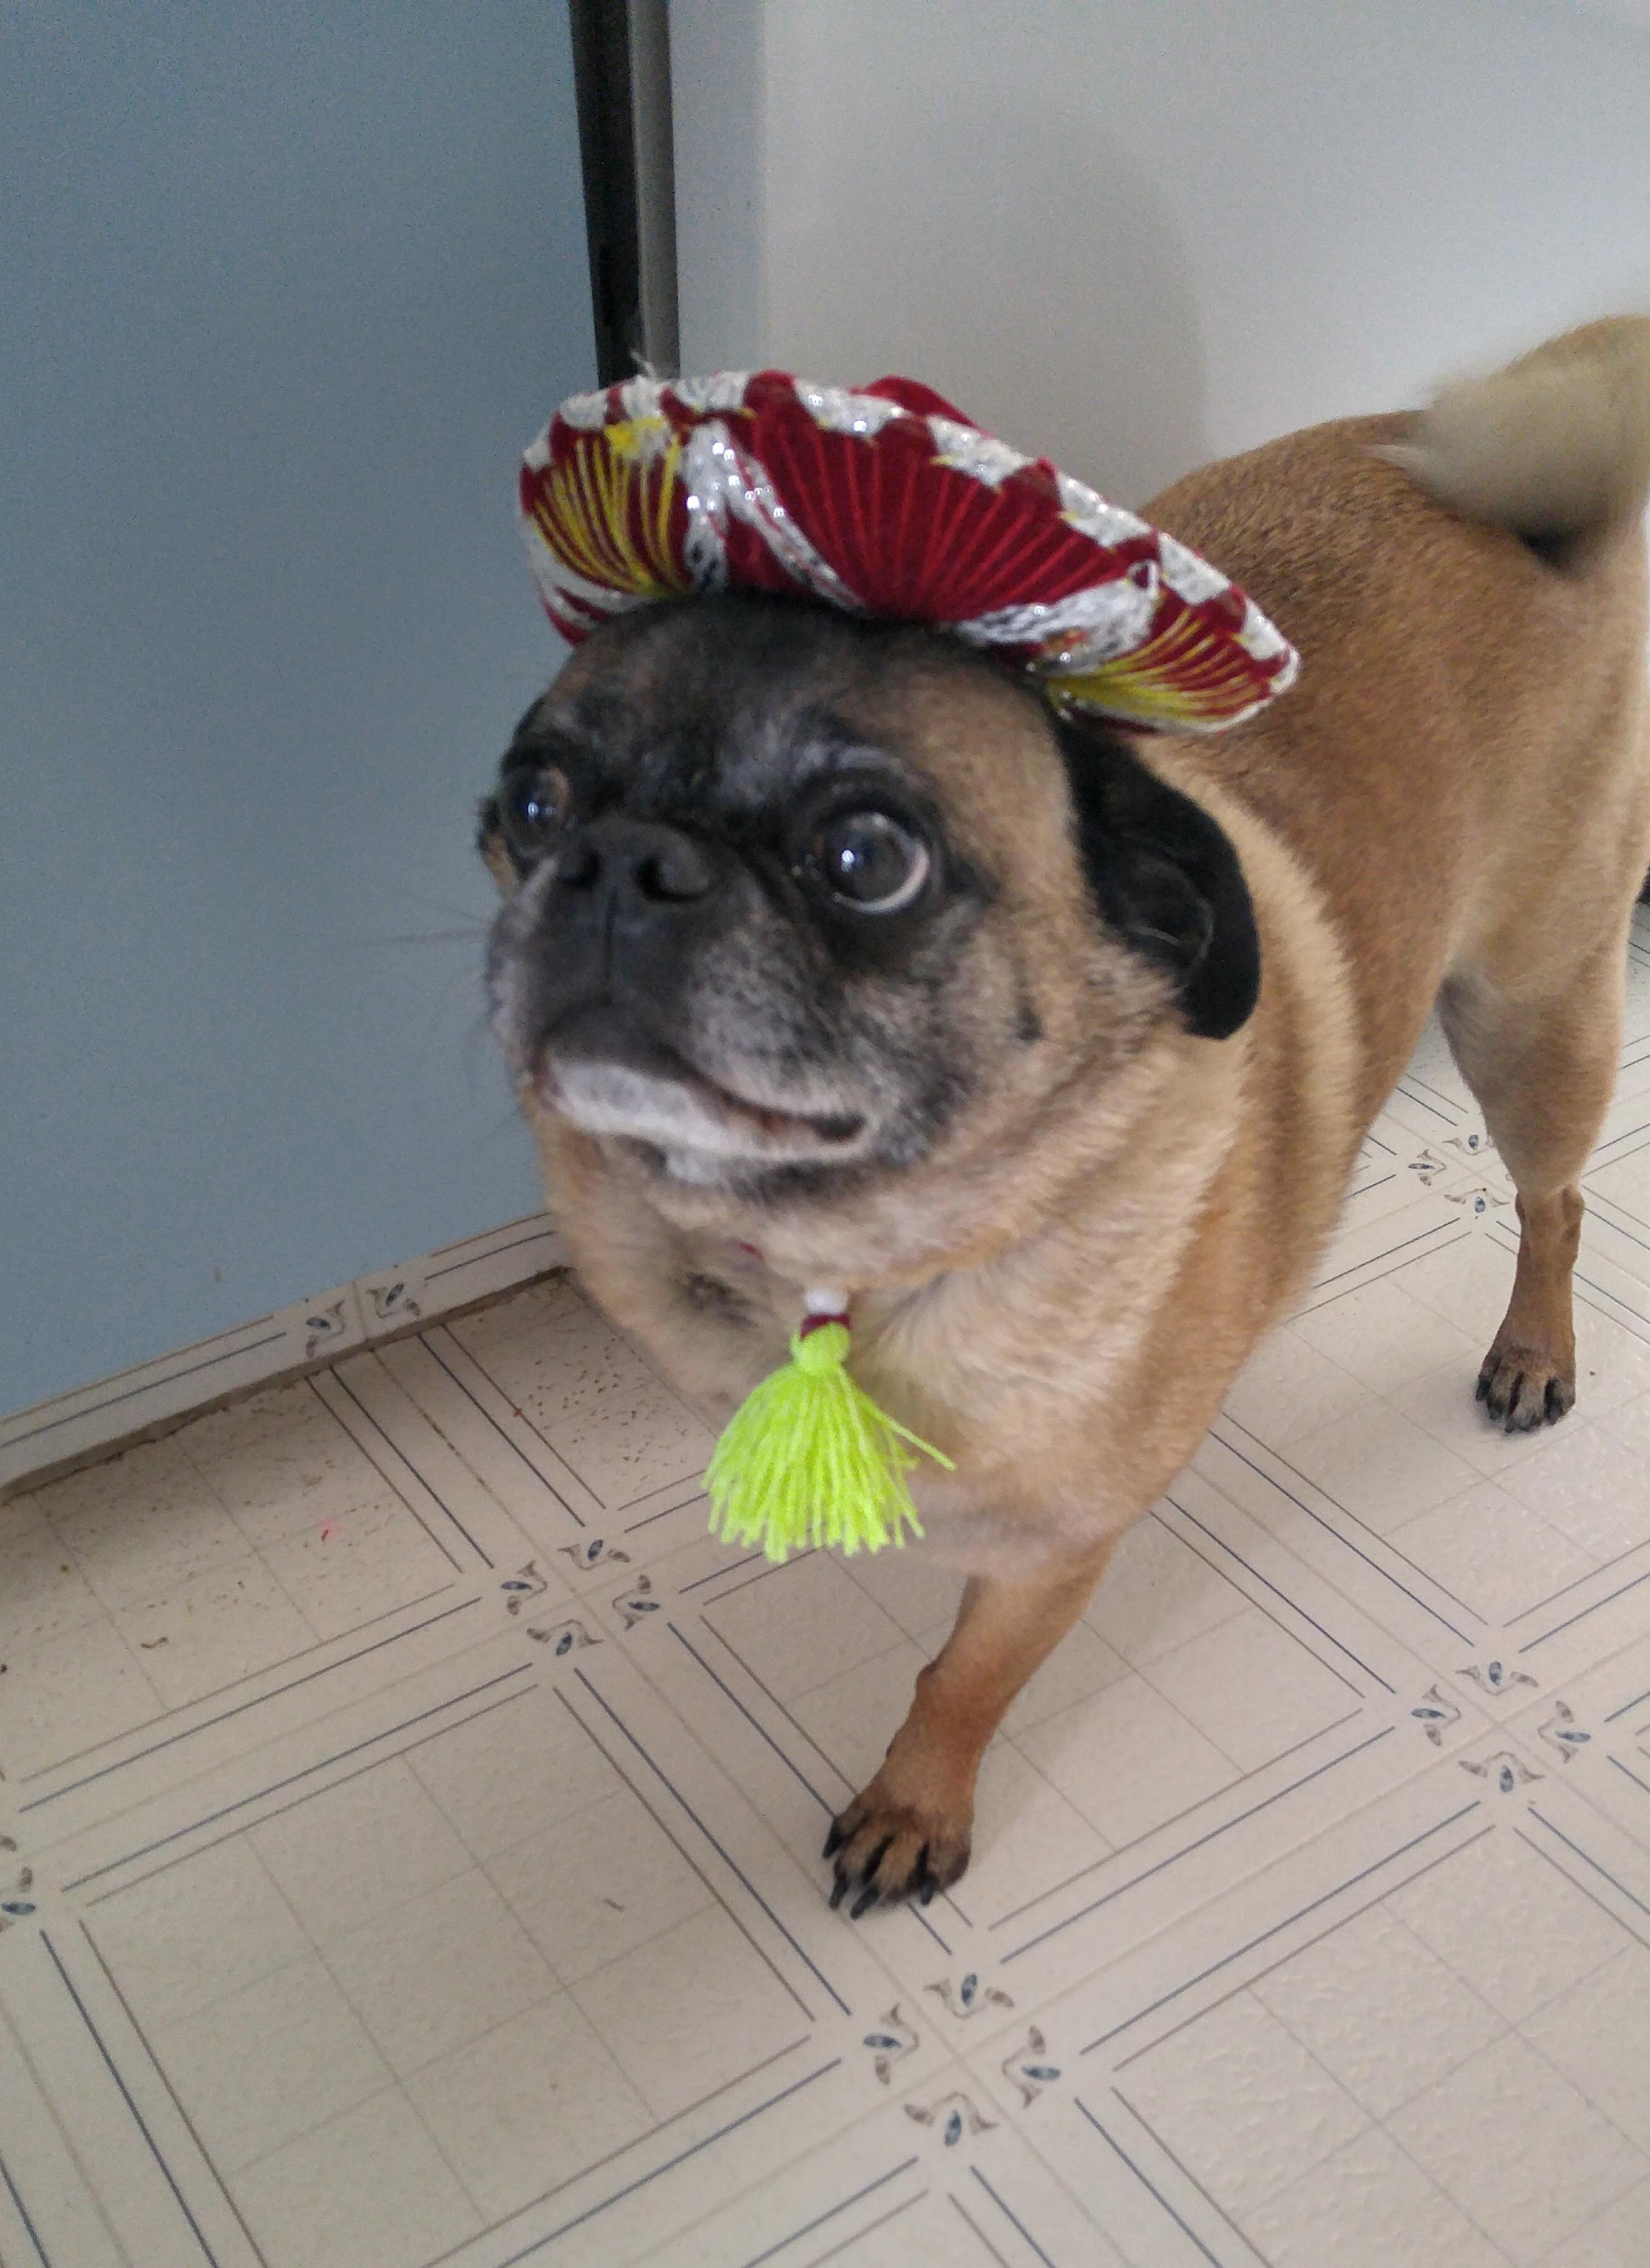 Psbattle Three Legged Pup With A Mini Sombrero Photoshop